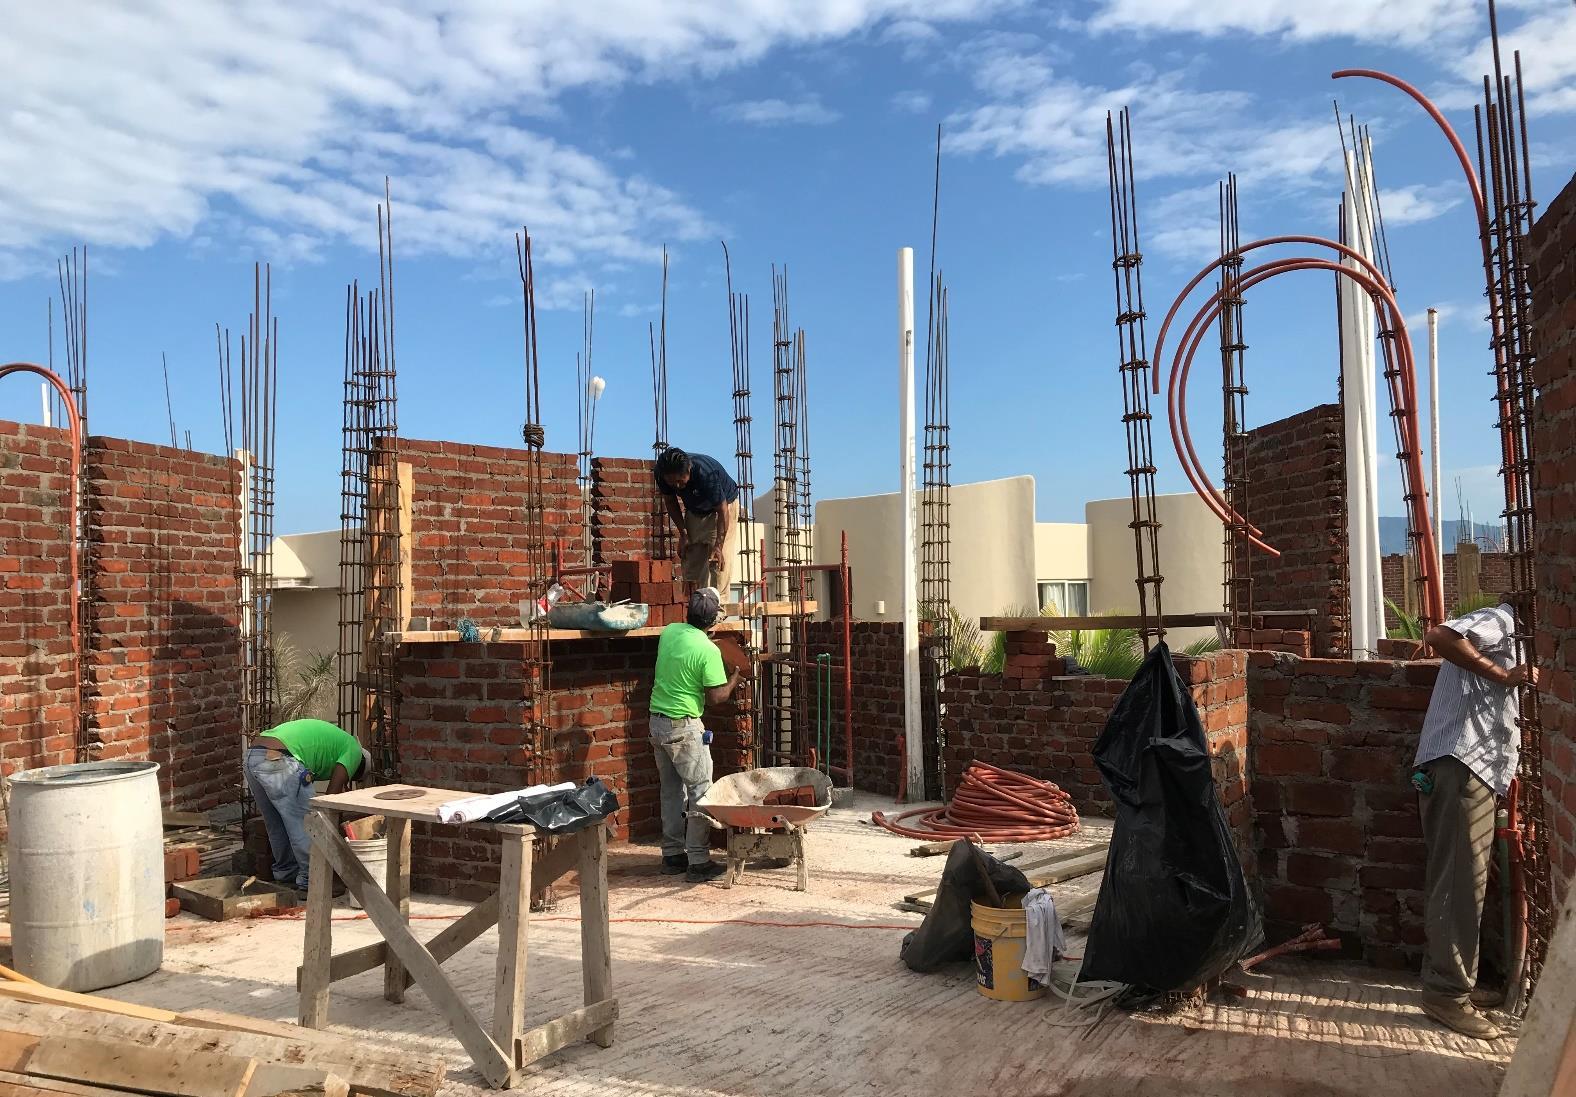 REPORTE-FOTOGRAFICO-PUNTA-MAJAHUA-23-SEPTIEMBRE-DEL-2018-005.jpg